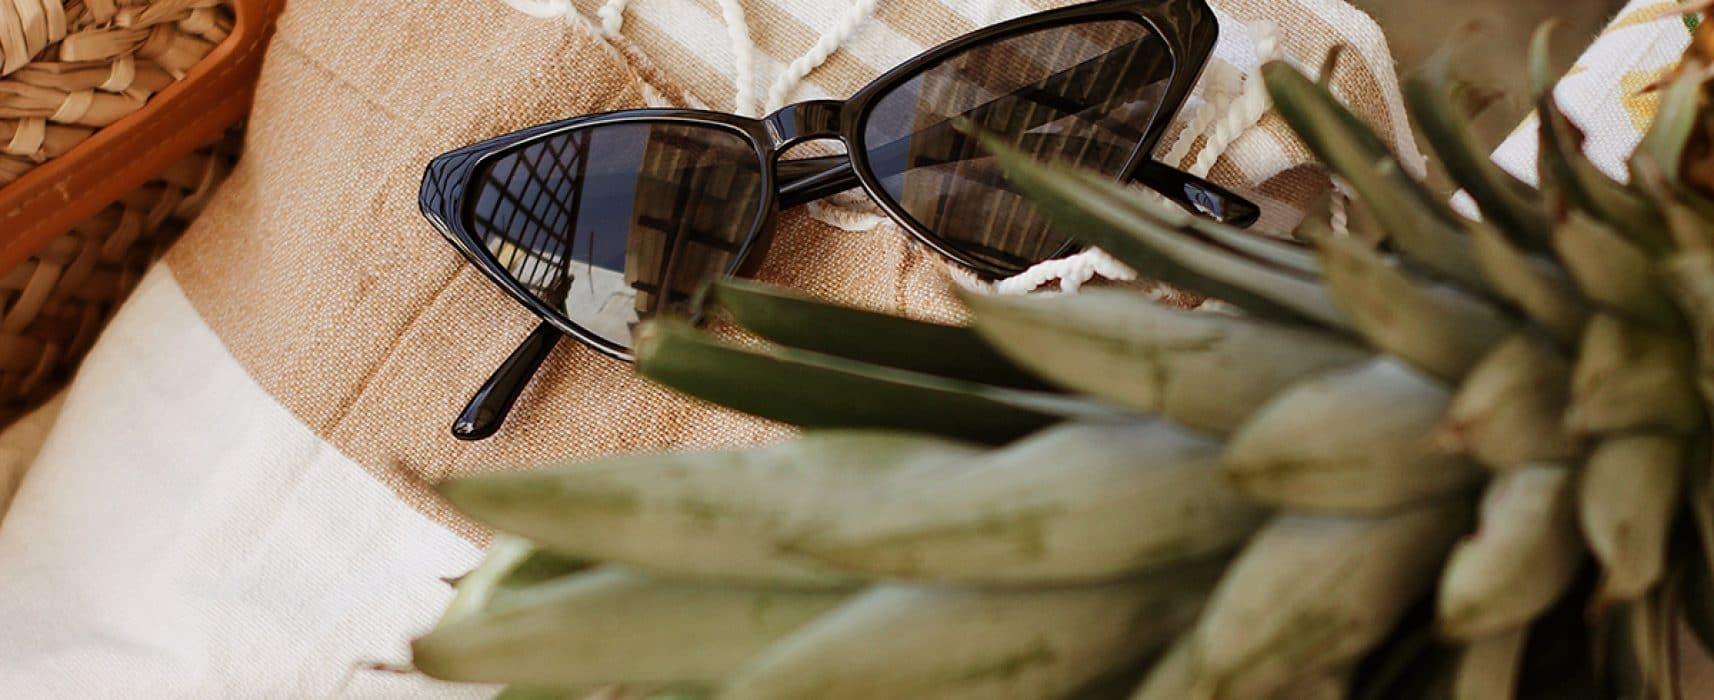 Sunglasses-pb4xzwzwc2avkwkzak8b9kqbakocgpumkig0n17gew